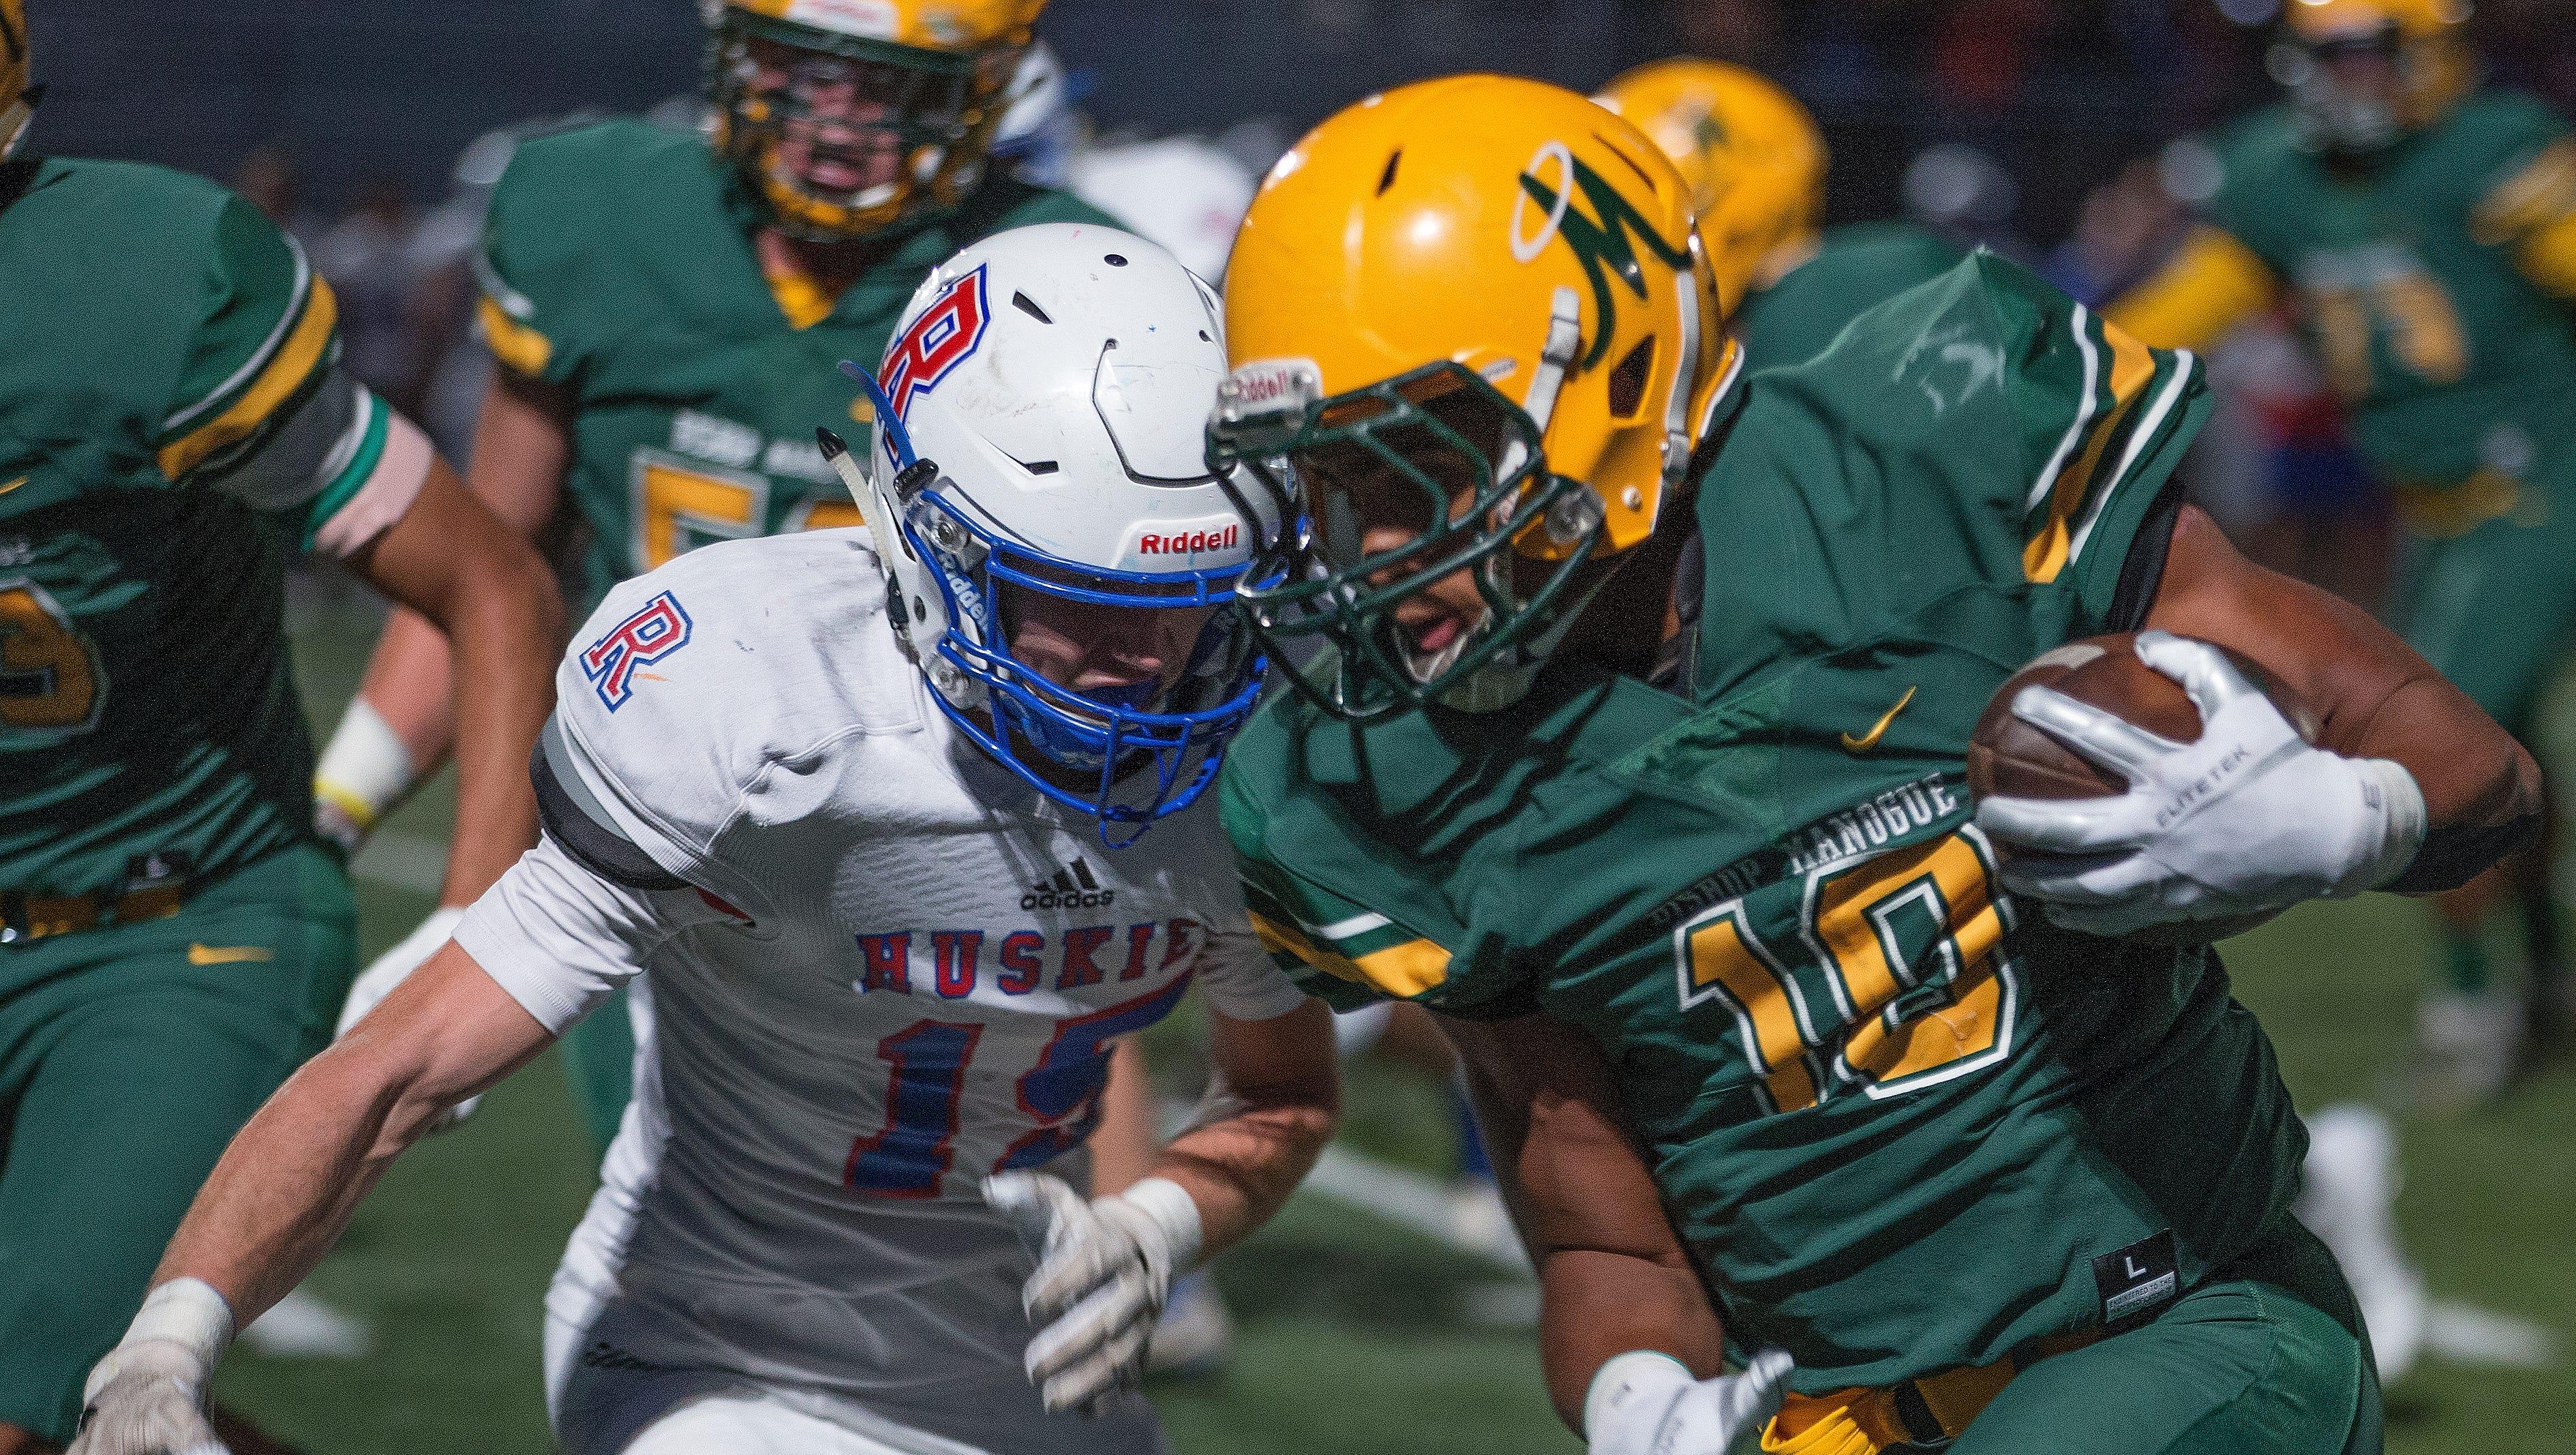 Manogue's Peyton Dixon( 10) is hit by Reno's Taskar Eason(15) in their football game played on Friday night, September 21, 2018 at Bishop Manogue High School in Reno.